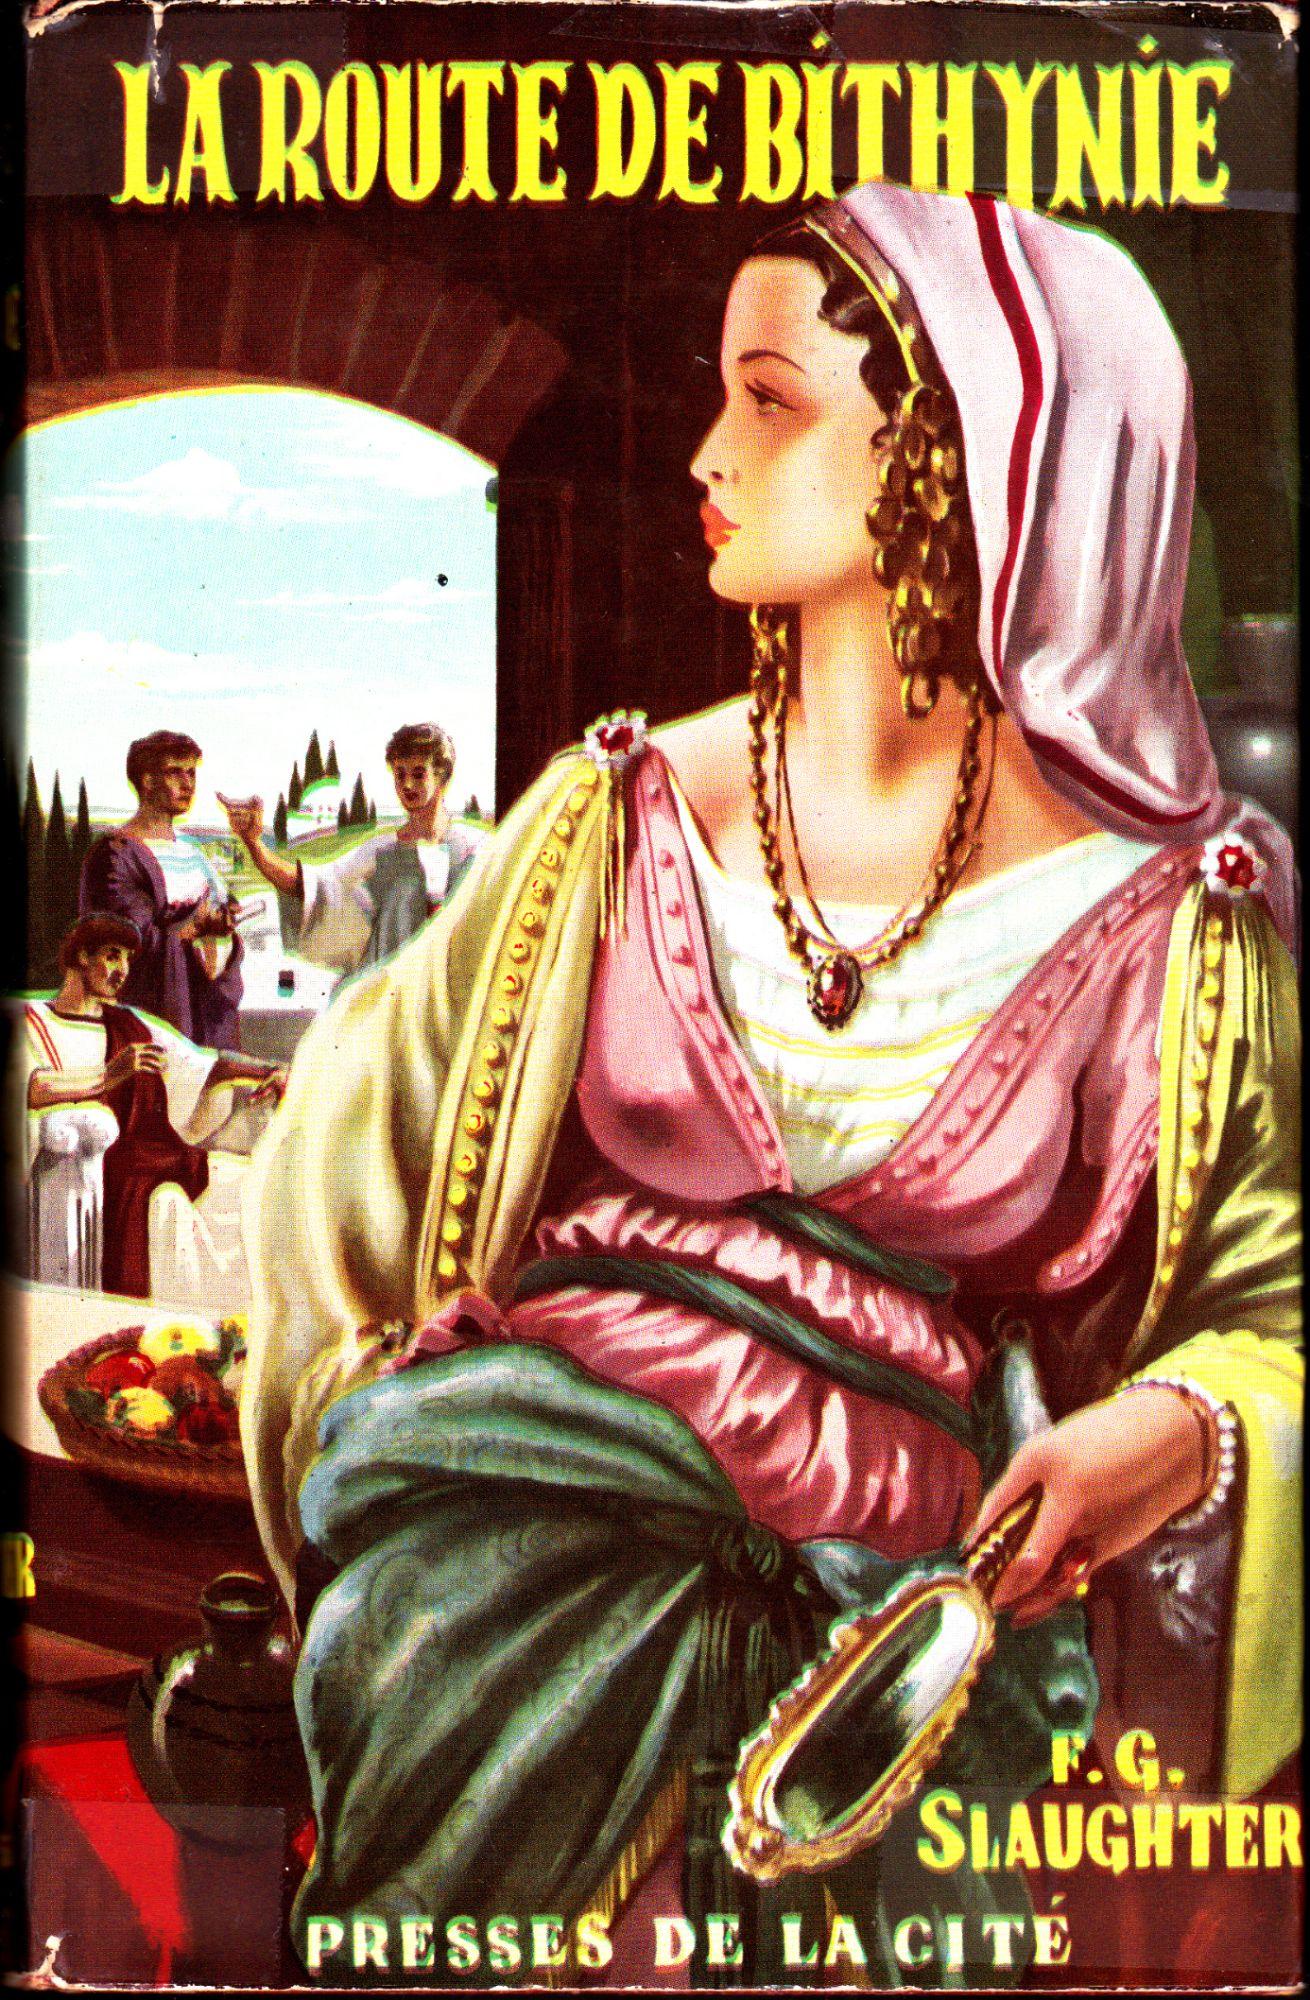 images.fr.shopping.rakuten.com/photo/1011932757.jpg